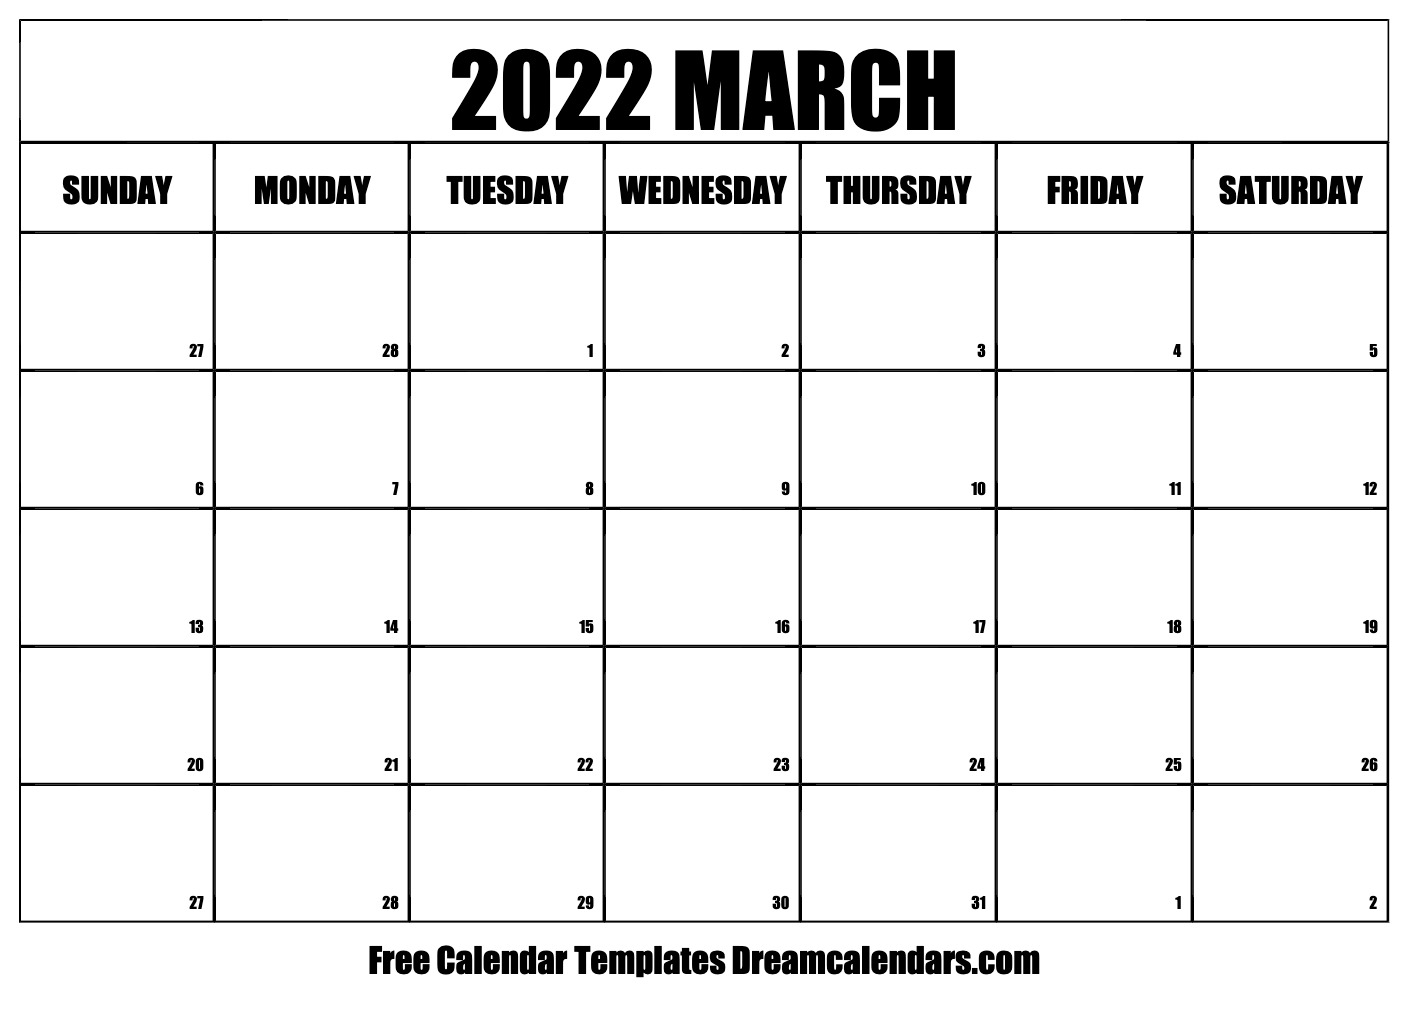 March 2022 Calendar | Free Blank Printable Templates Within 2022 March 2 Page Printable Calendar